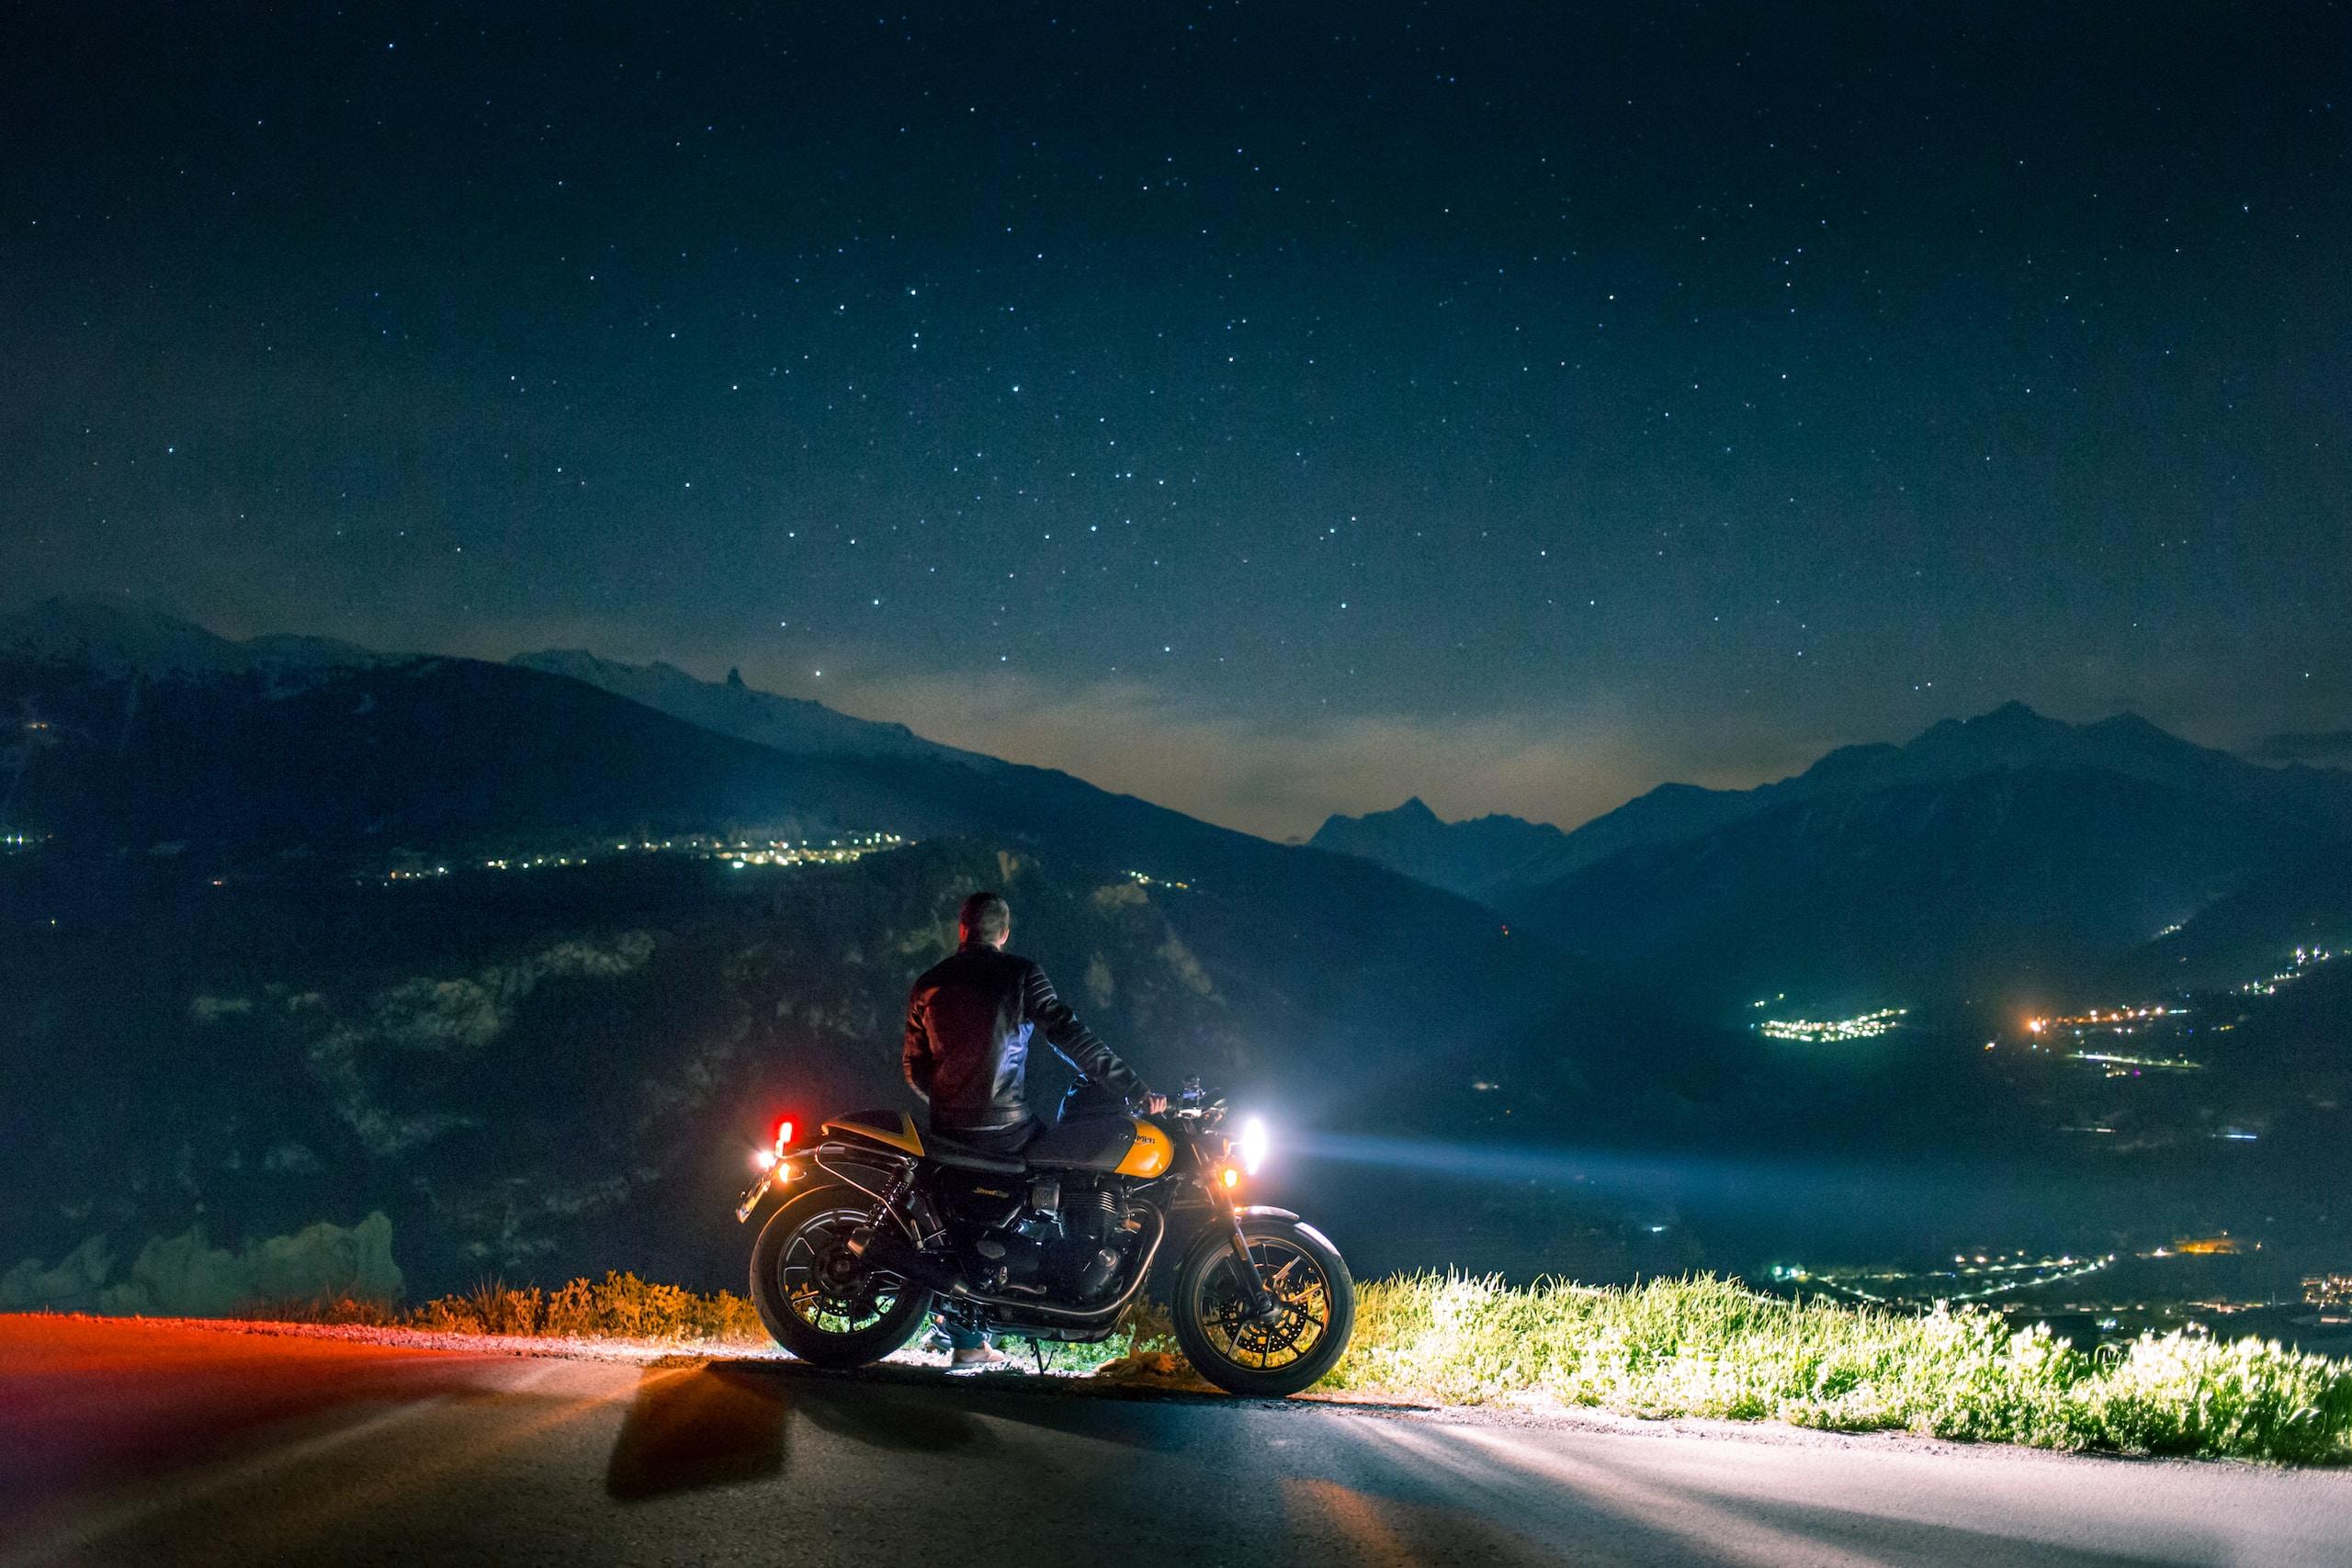 man siting on motorcycle at night